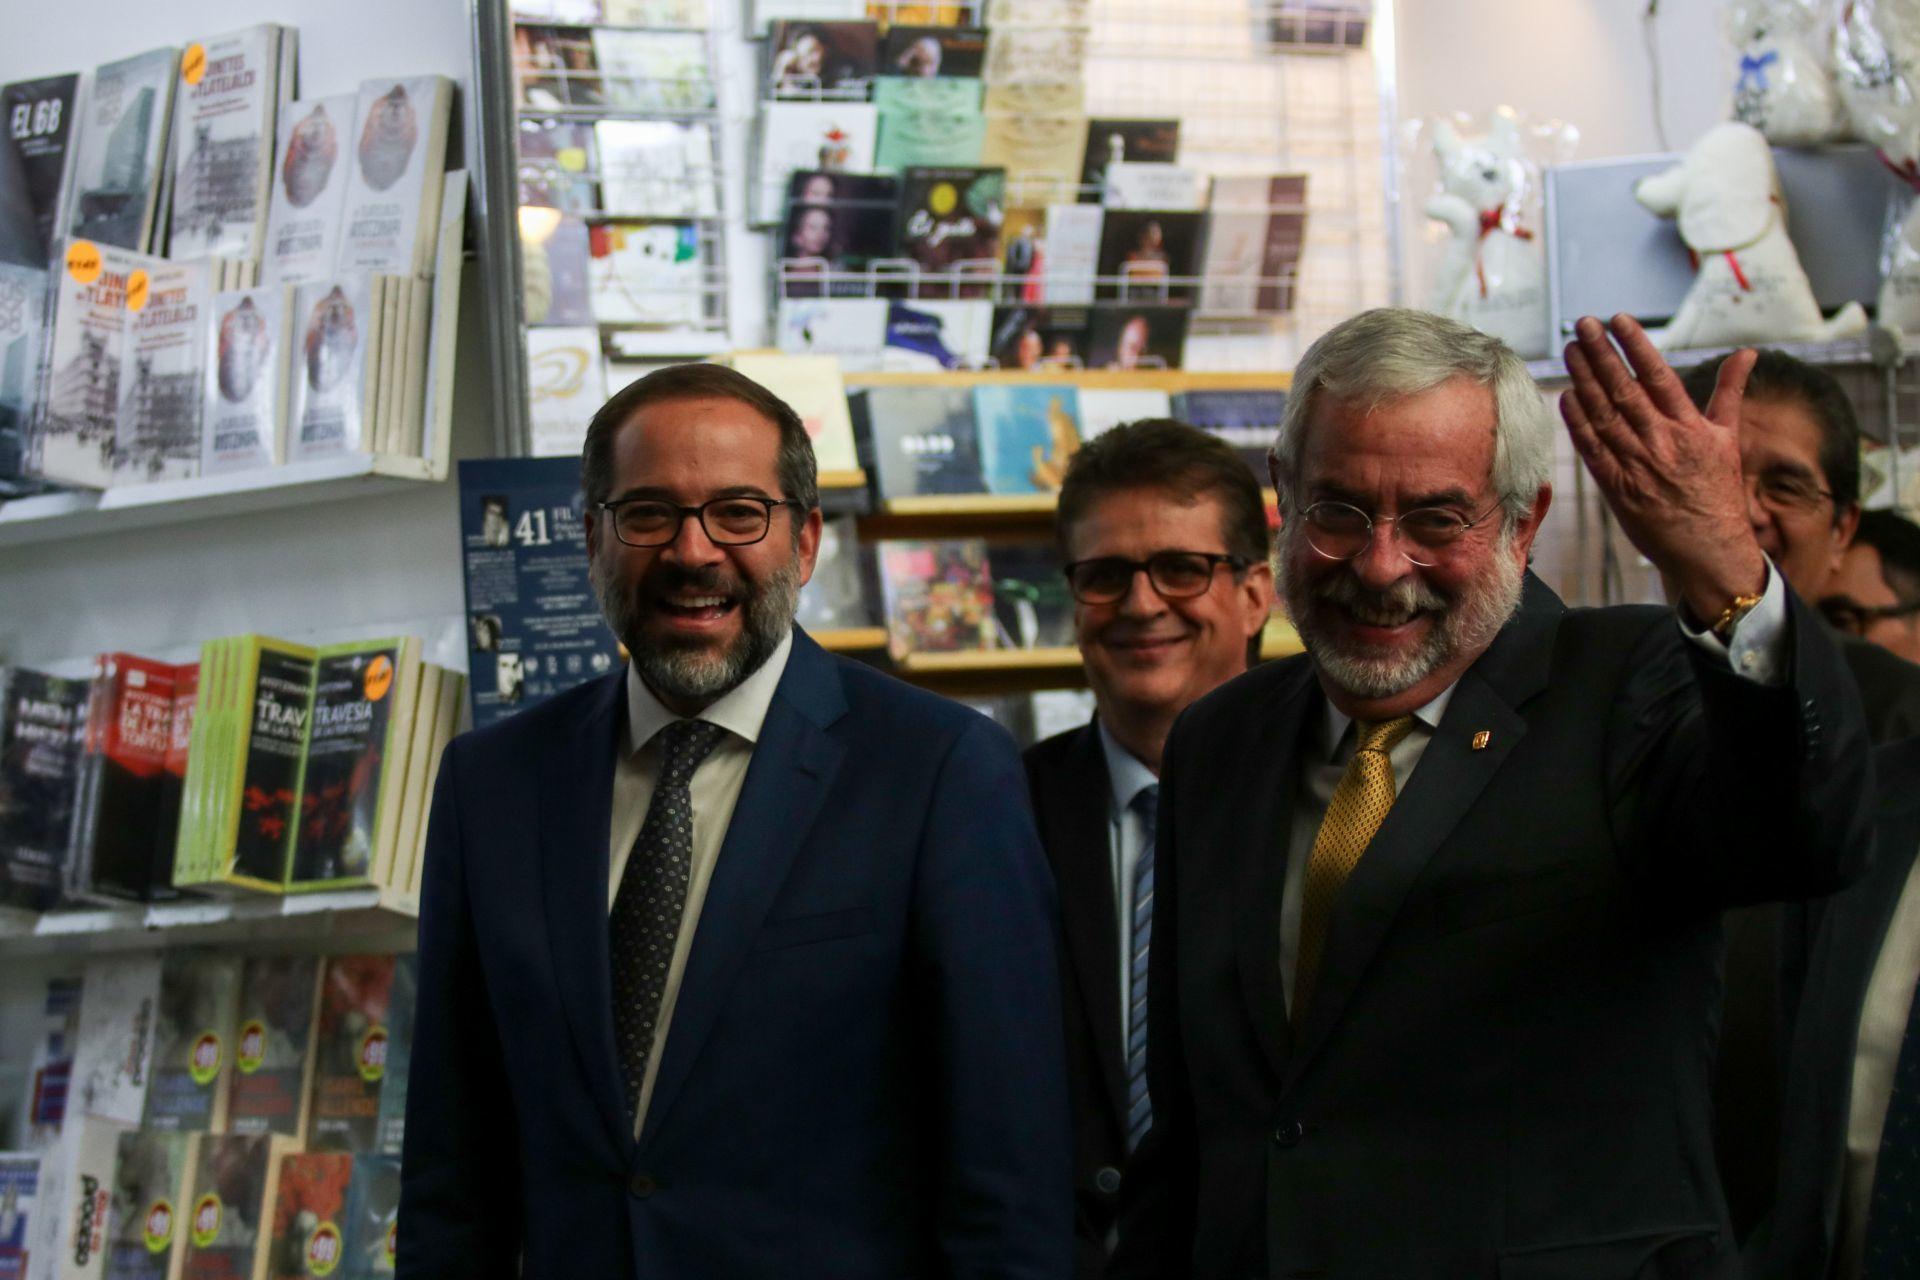 Gobernador de Colima se contagia de Covid-19 por segunda vez